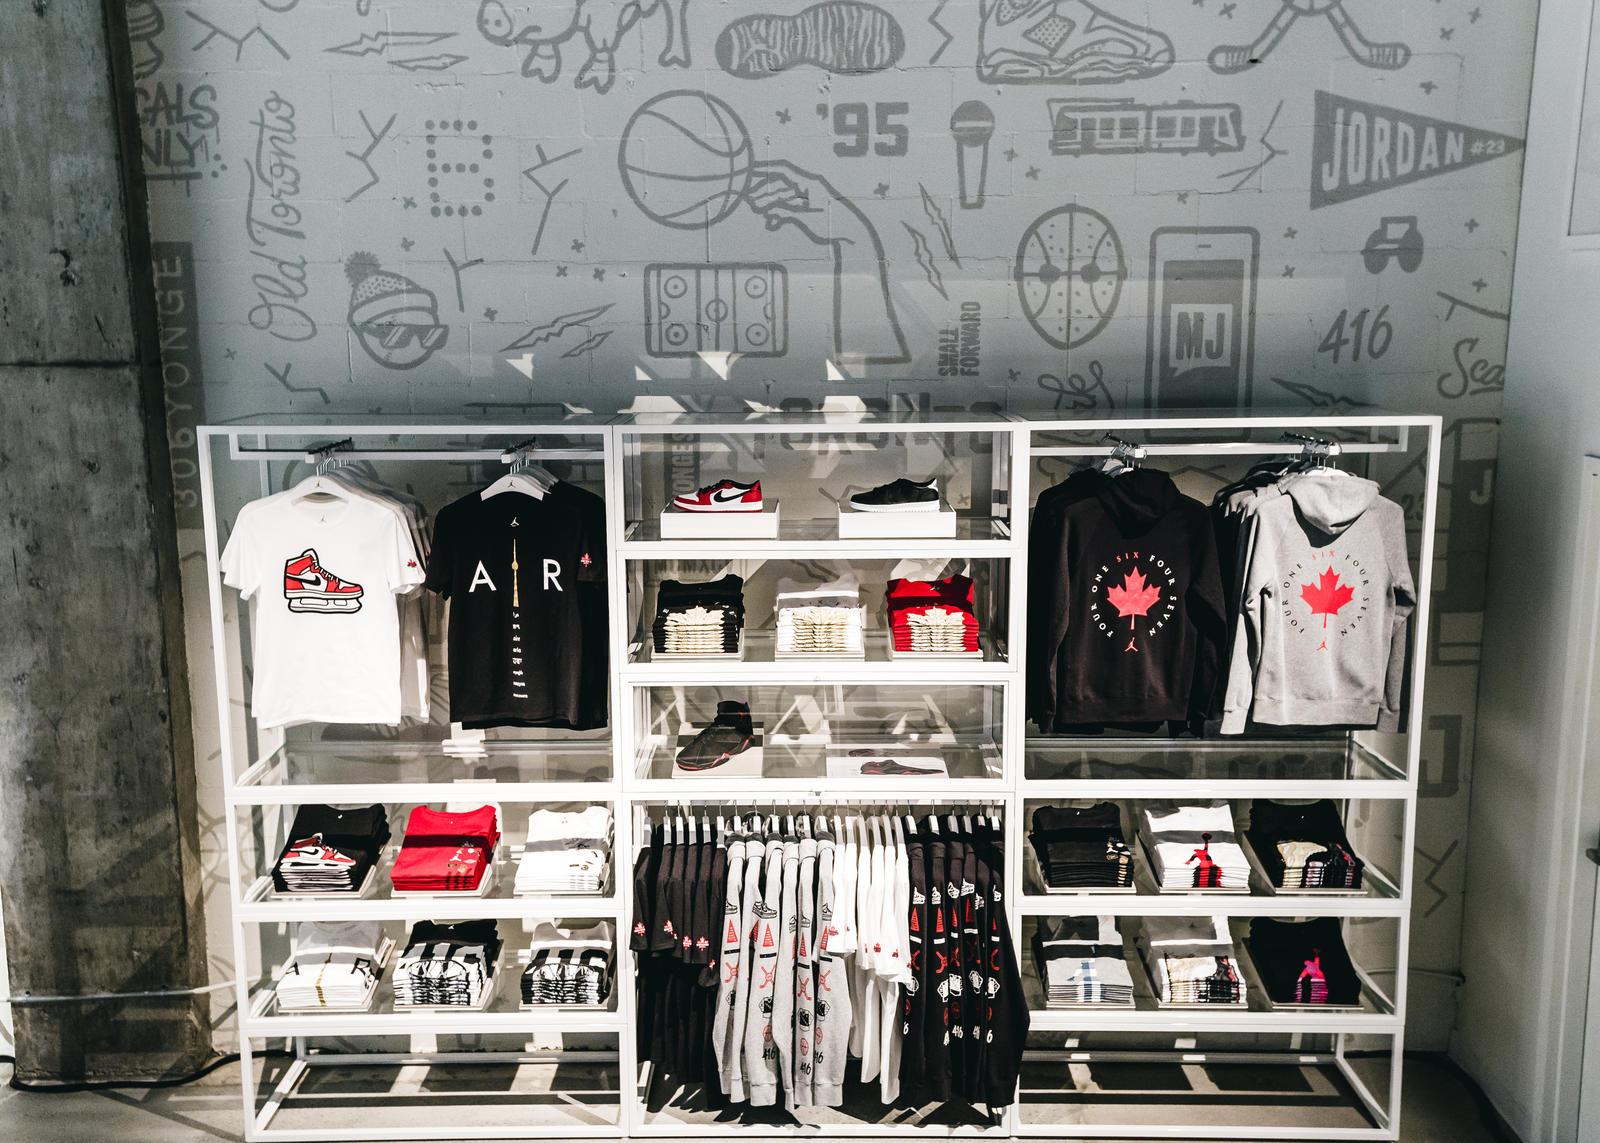 306 Yonge, Jordan Retail Store